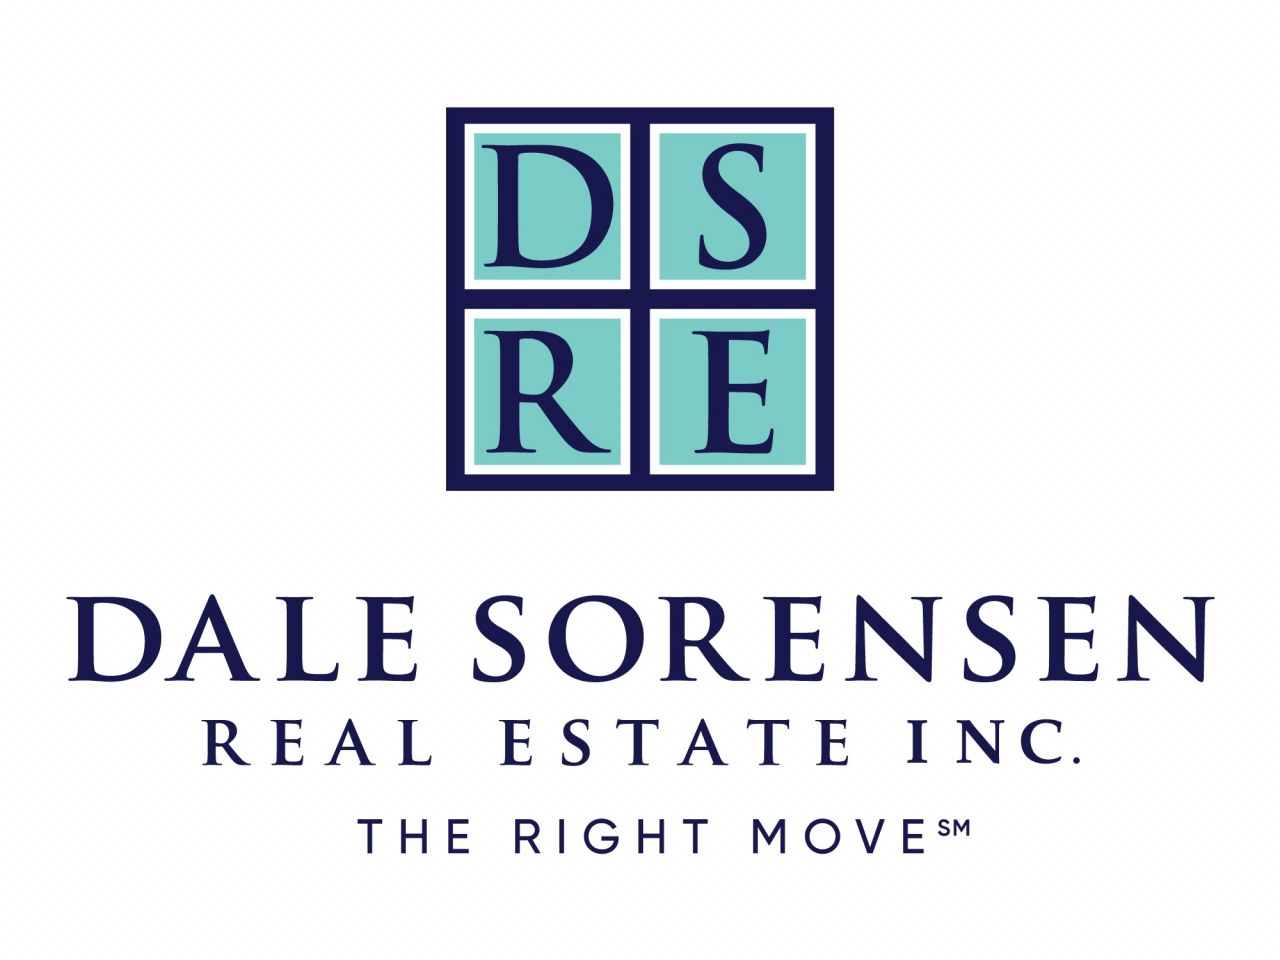 Dale Sorensen Real Estate, Inc.